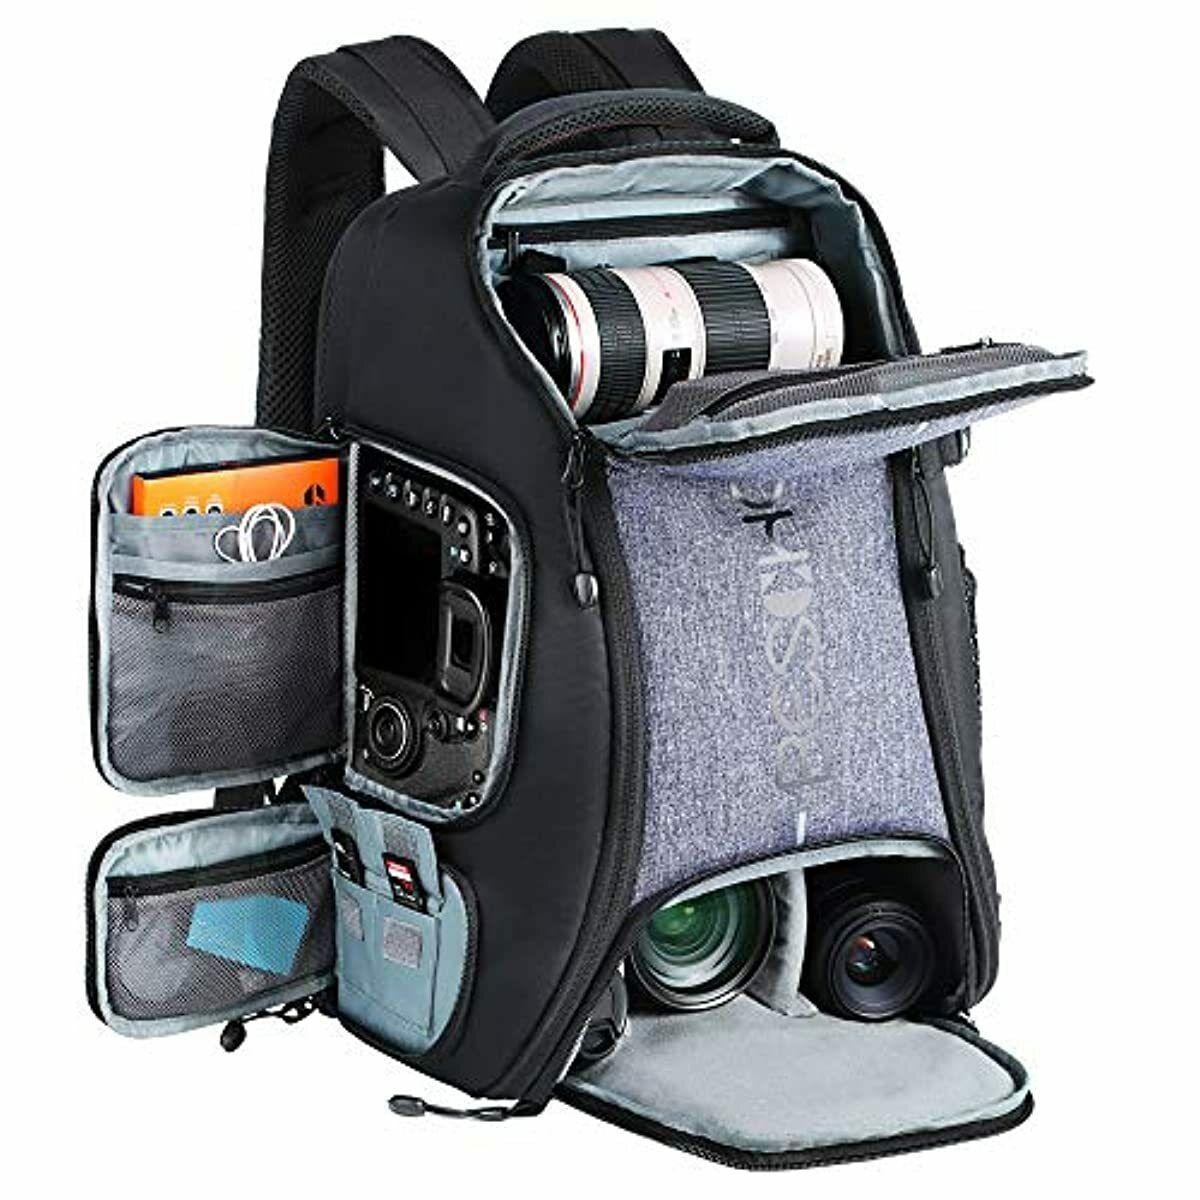 Beschoi Waterproof SLR Camera Bag, 25 liters Large Capacity Rucksack with Tripod